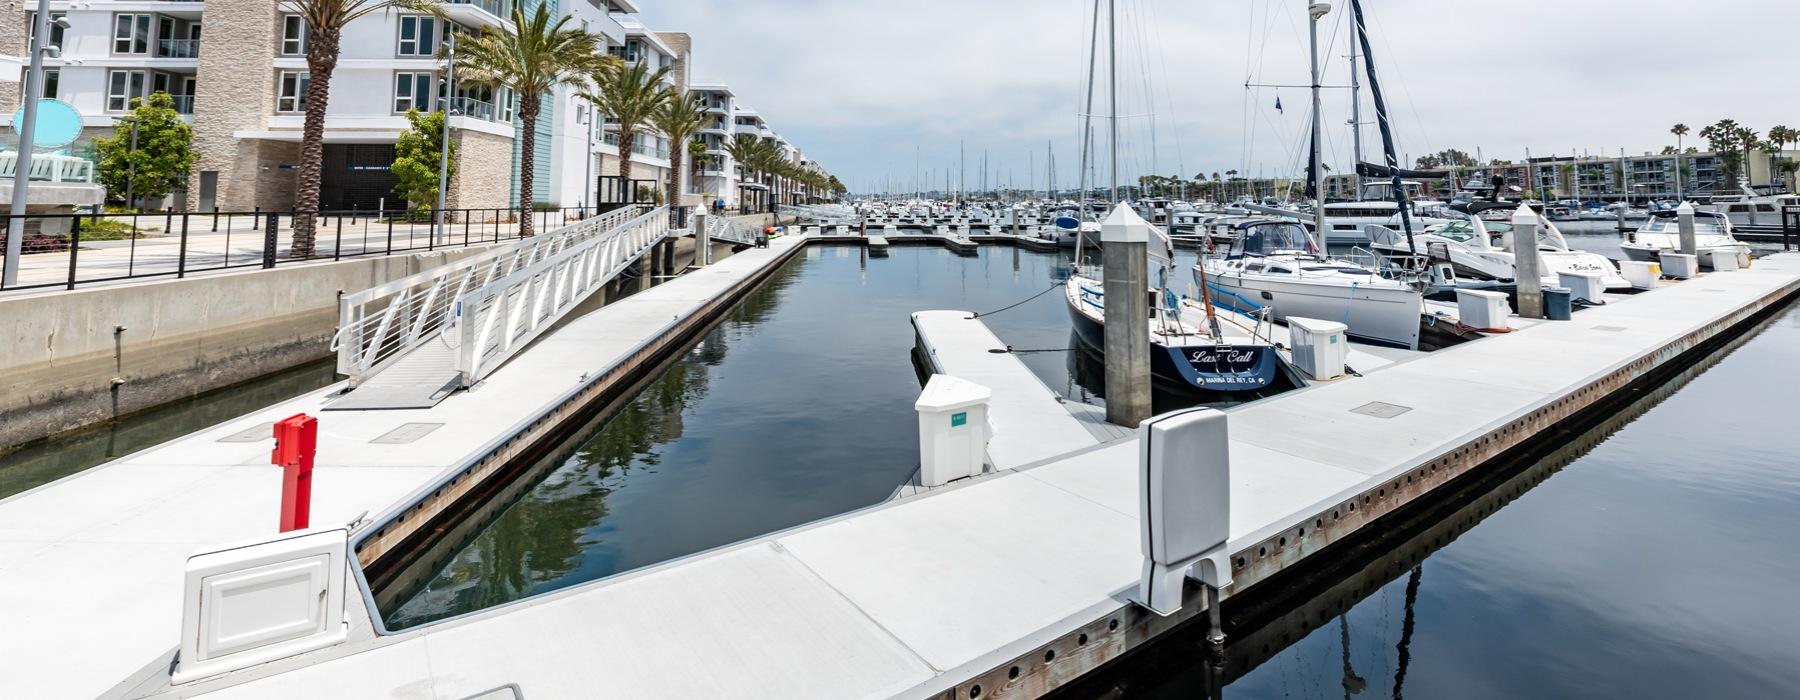 Neptune Marina boat docks